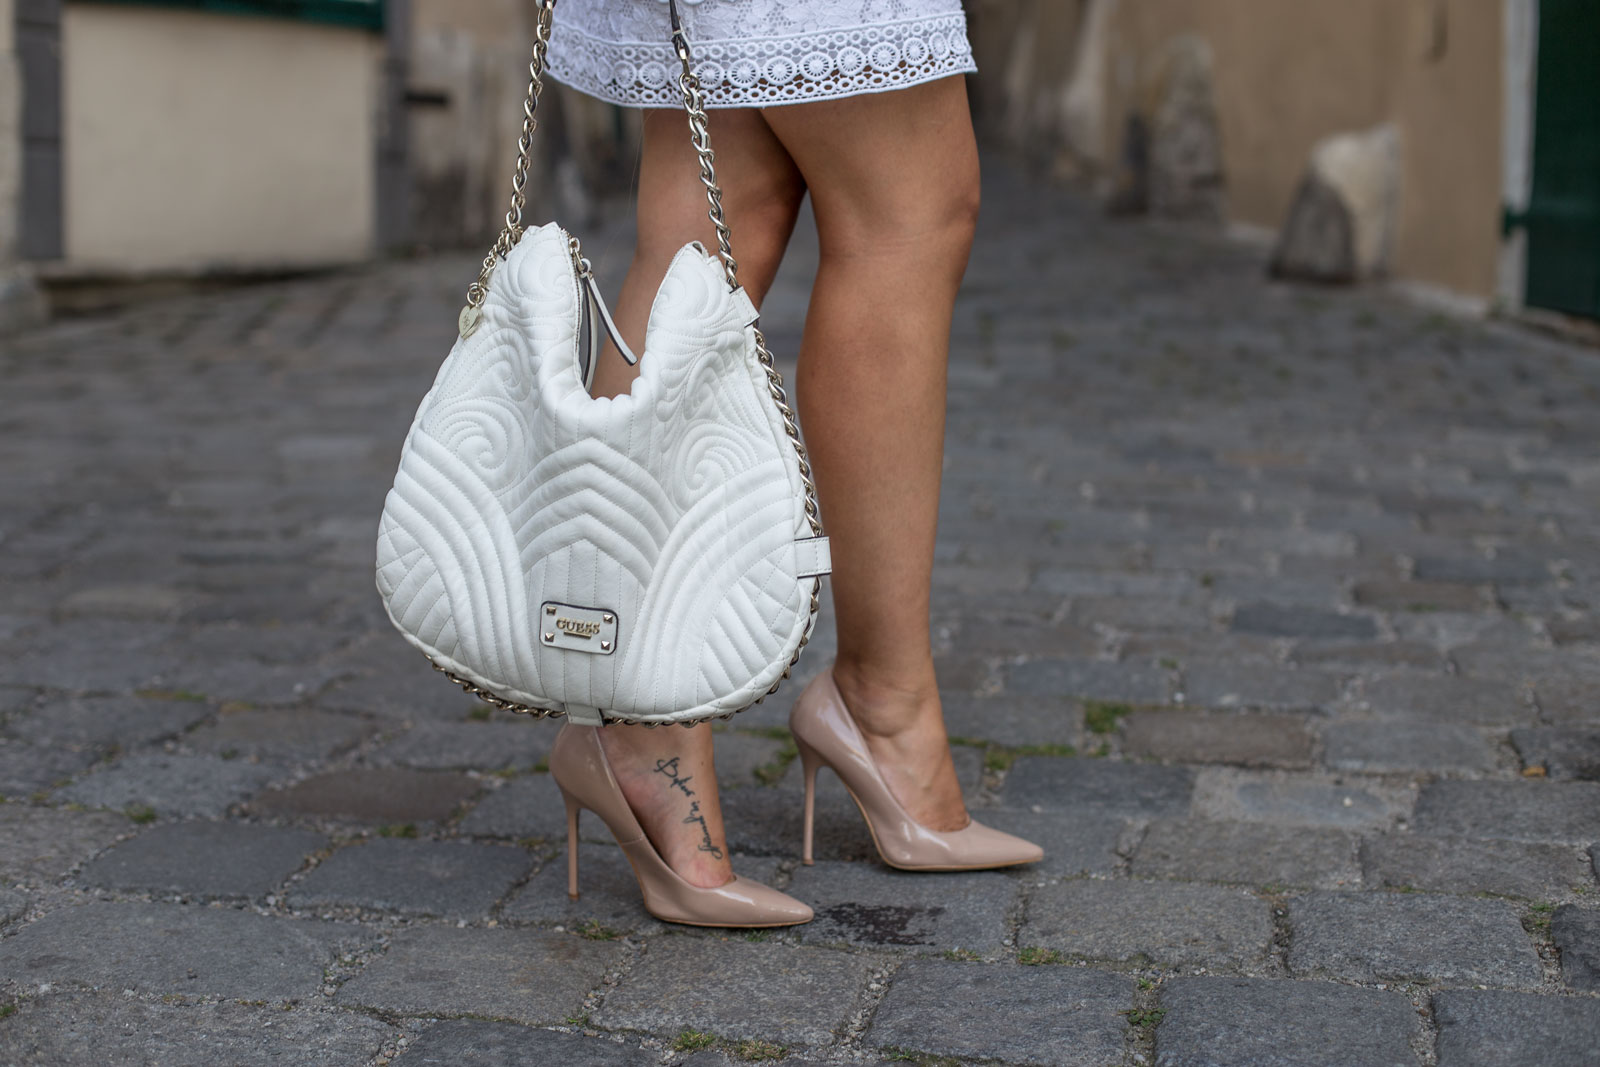 how-to-wear.lace-Foto_by_Nadja_Nemetz_Wien_Outfit_Fashion_Mode_Modeblogger_Blogger_qweiß_weiss_Spitzenkleid_Lace_dress_lacedress_how_to_wear_styleguide_guess_bag_tasche_highheels_high_heels_nude_buffalo_2